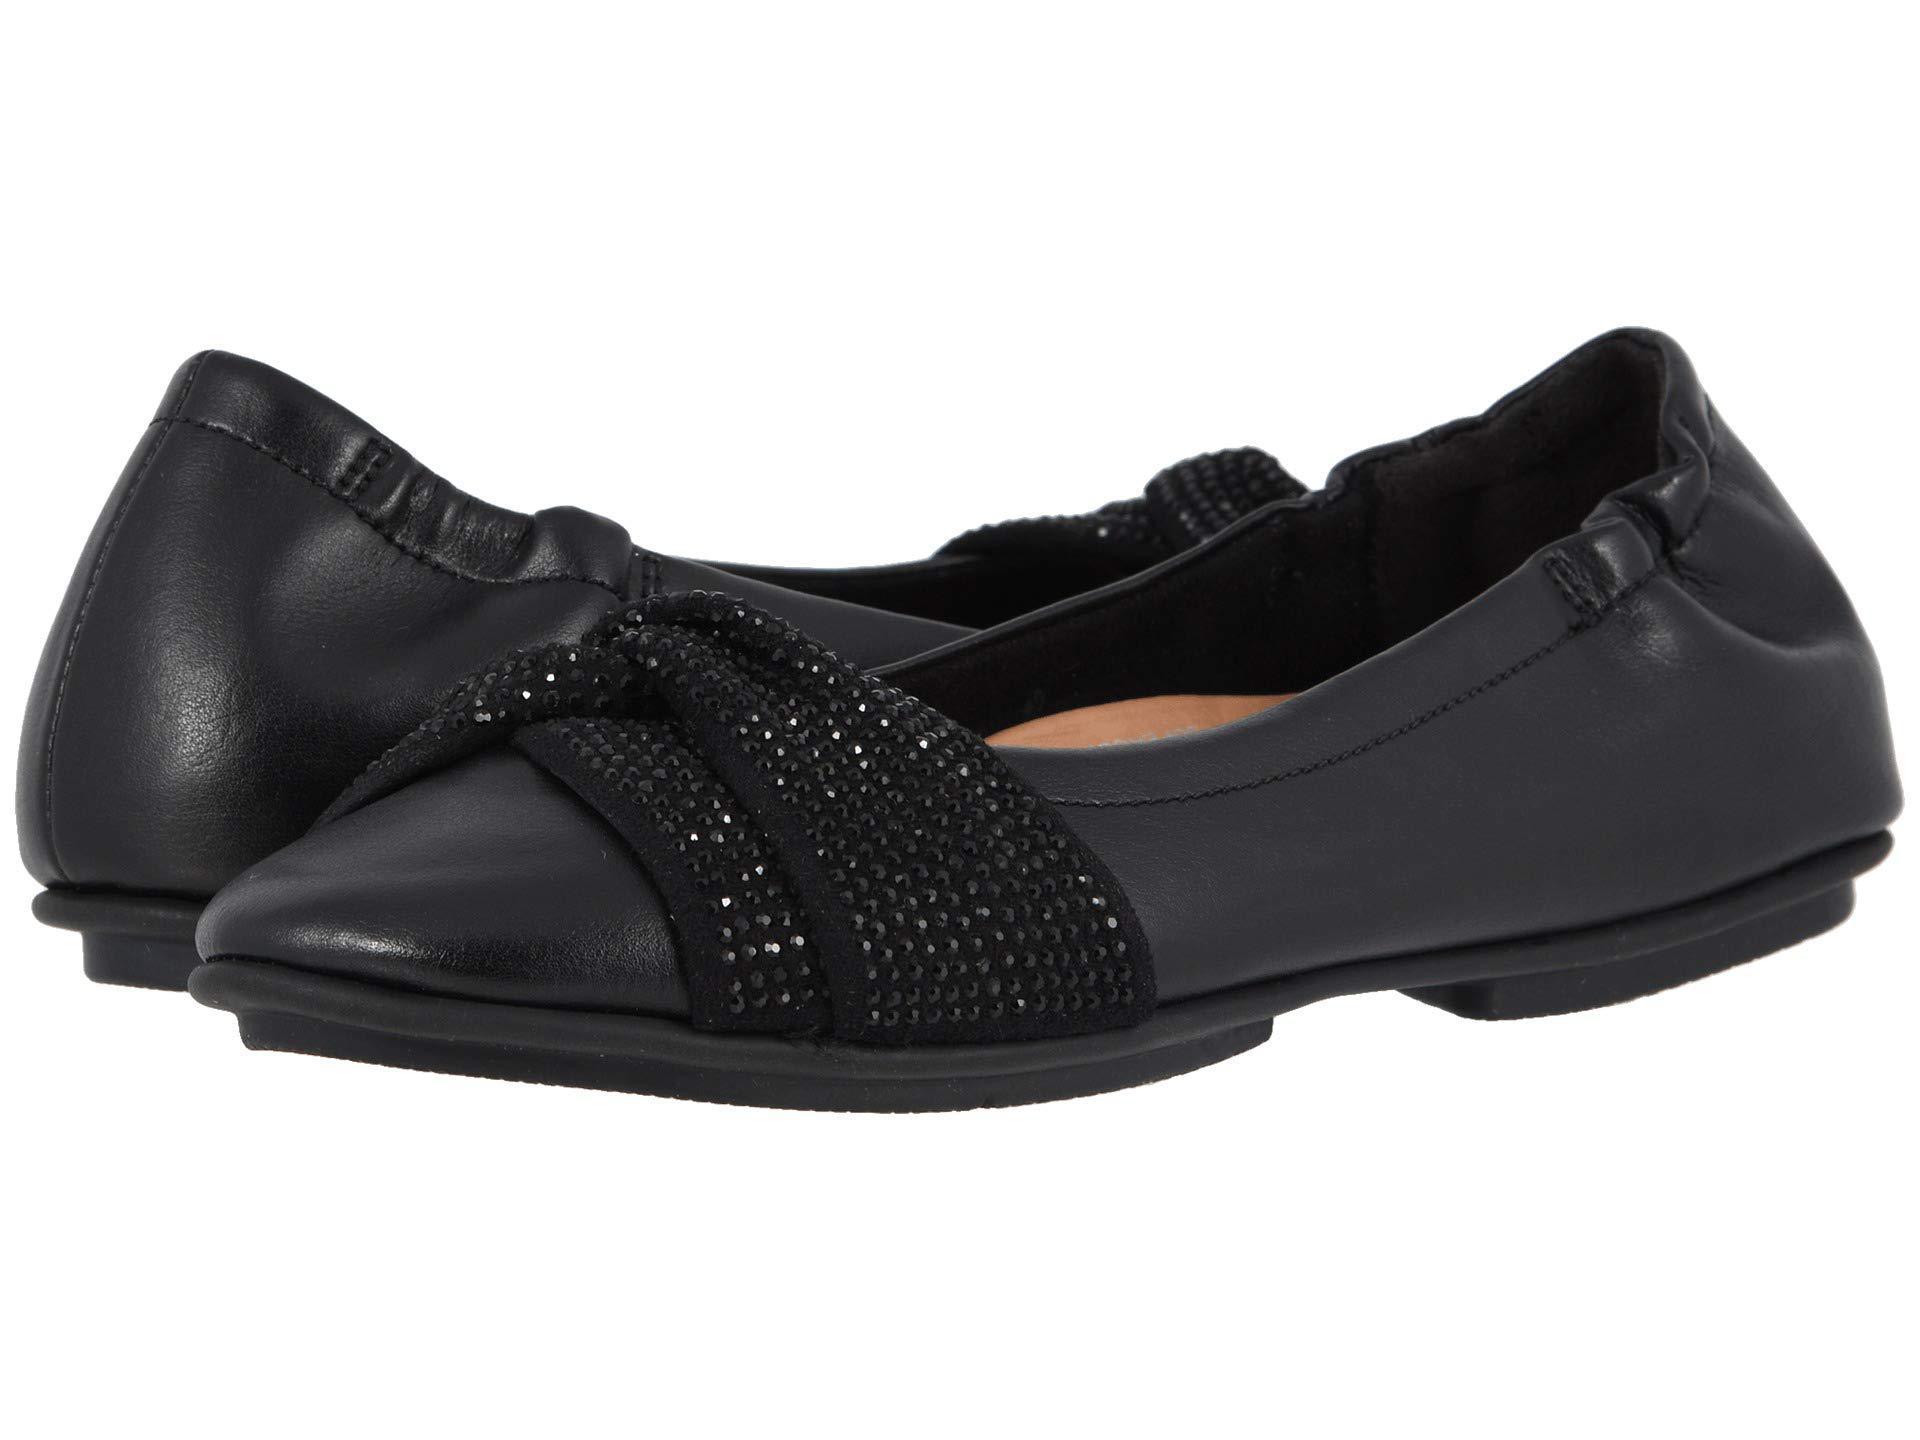 979b87c44 Lyst - Fitflop Twiss Crystal (black) Women s Flat Shoes in Black